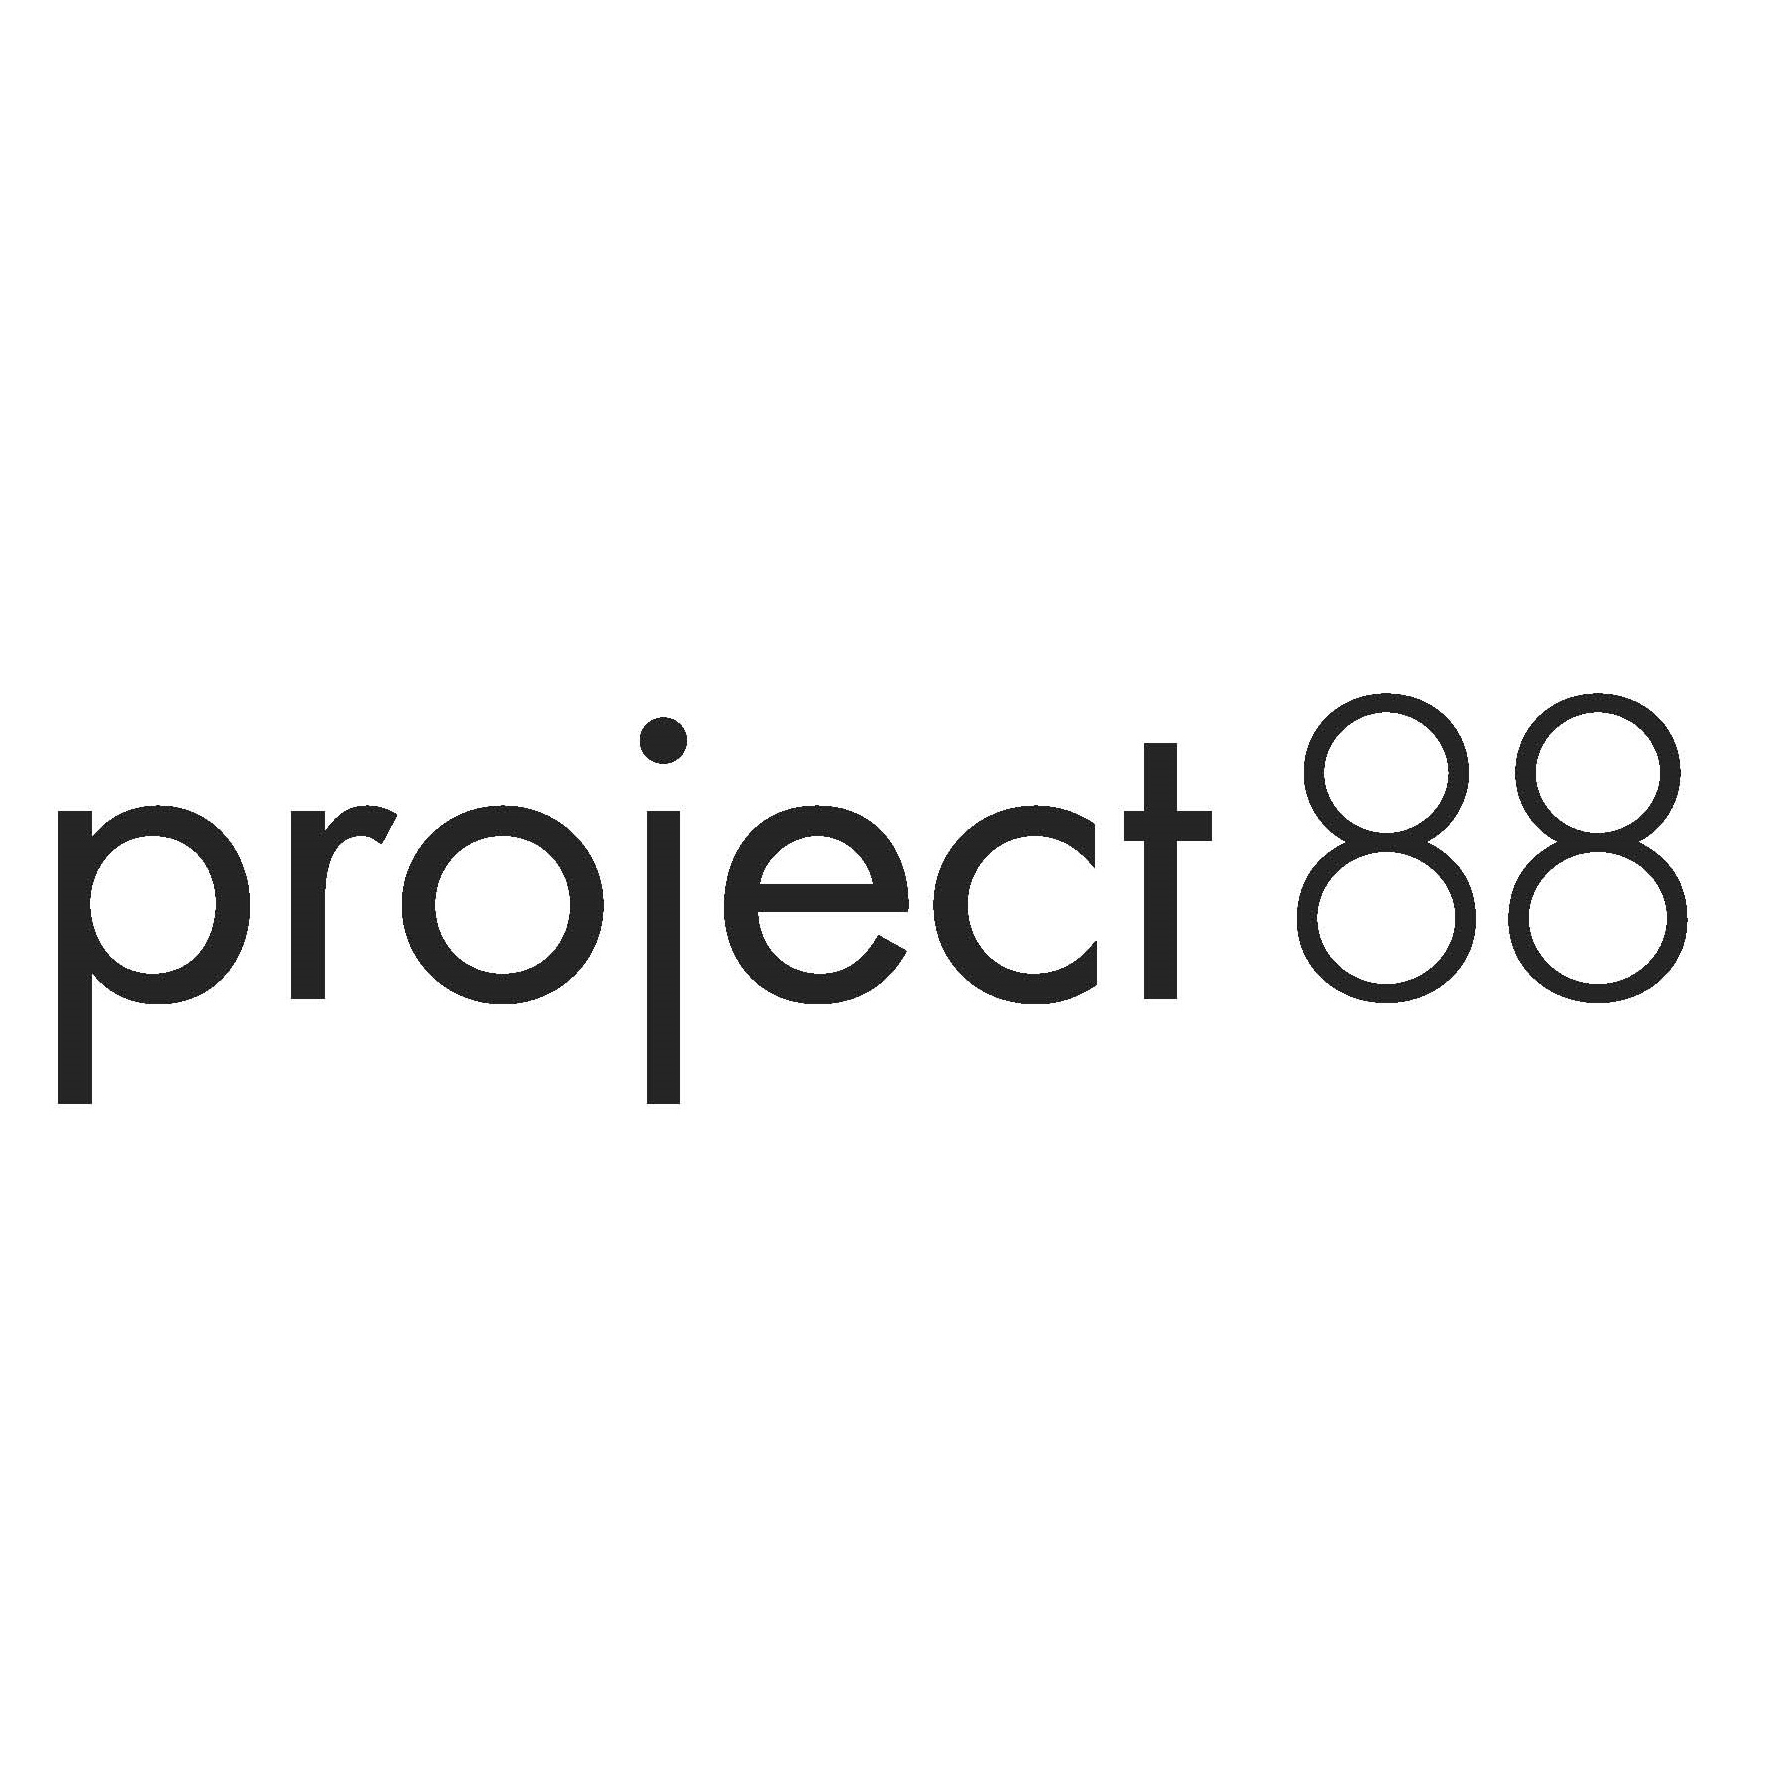 Project88 logotype.jpg